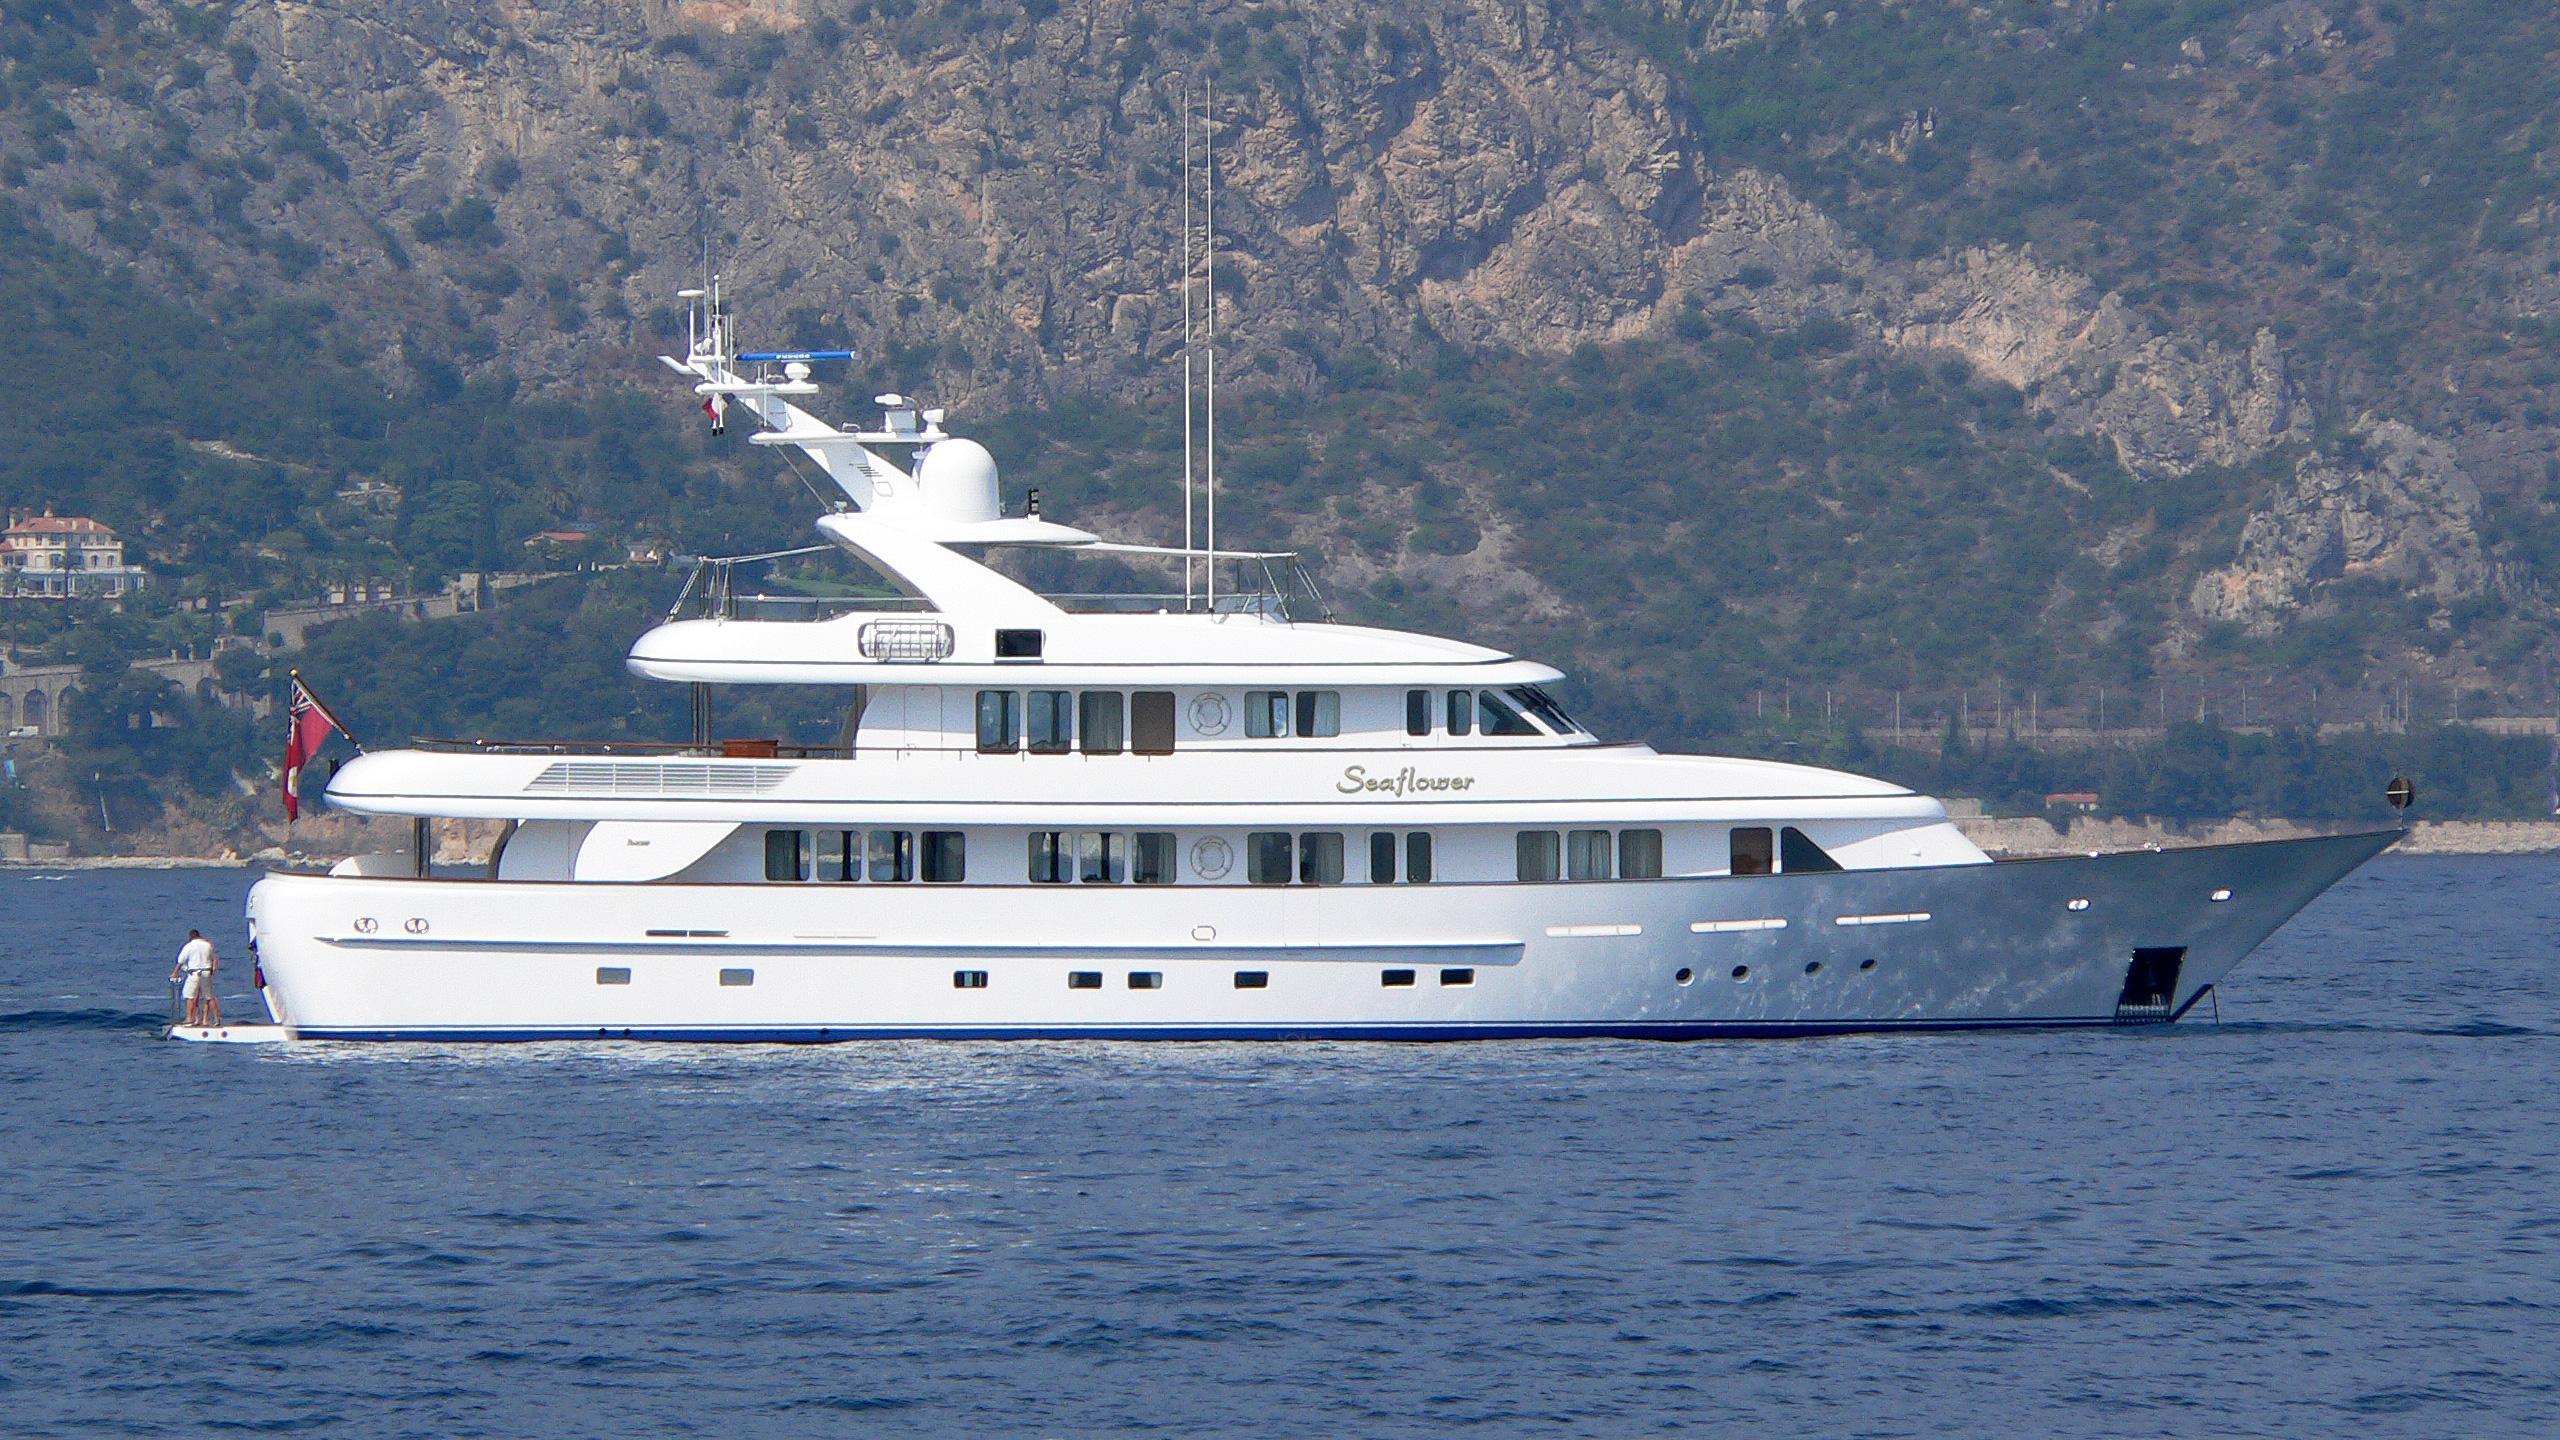 cipitouba-seaflower-motor-yacht-feadship-2002-40m-profile